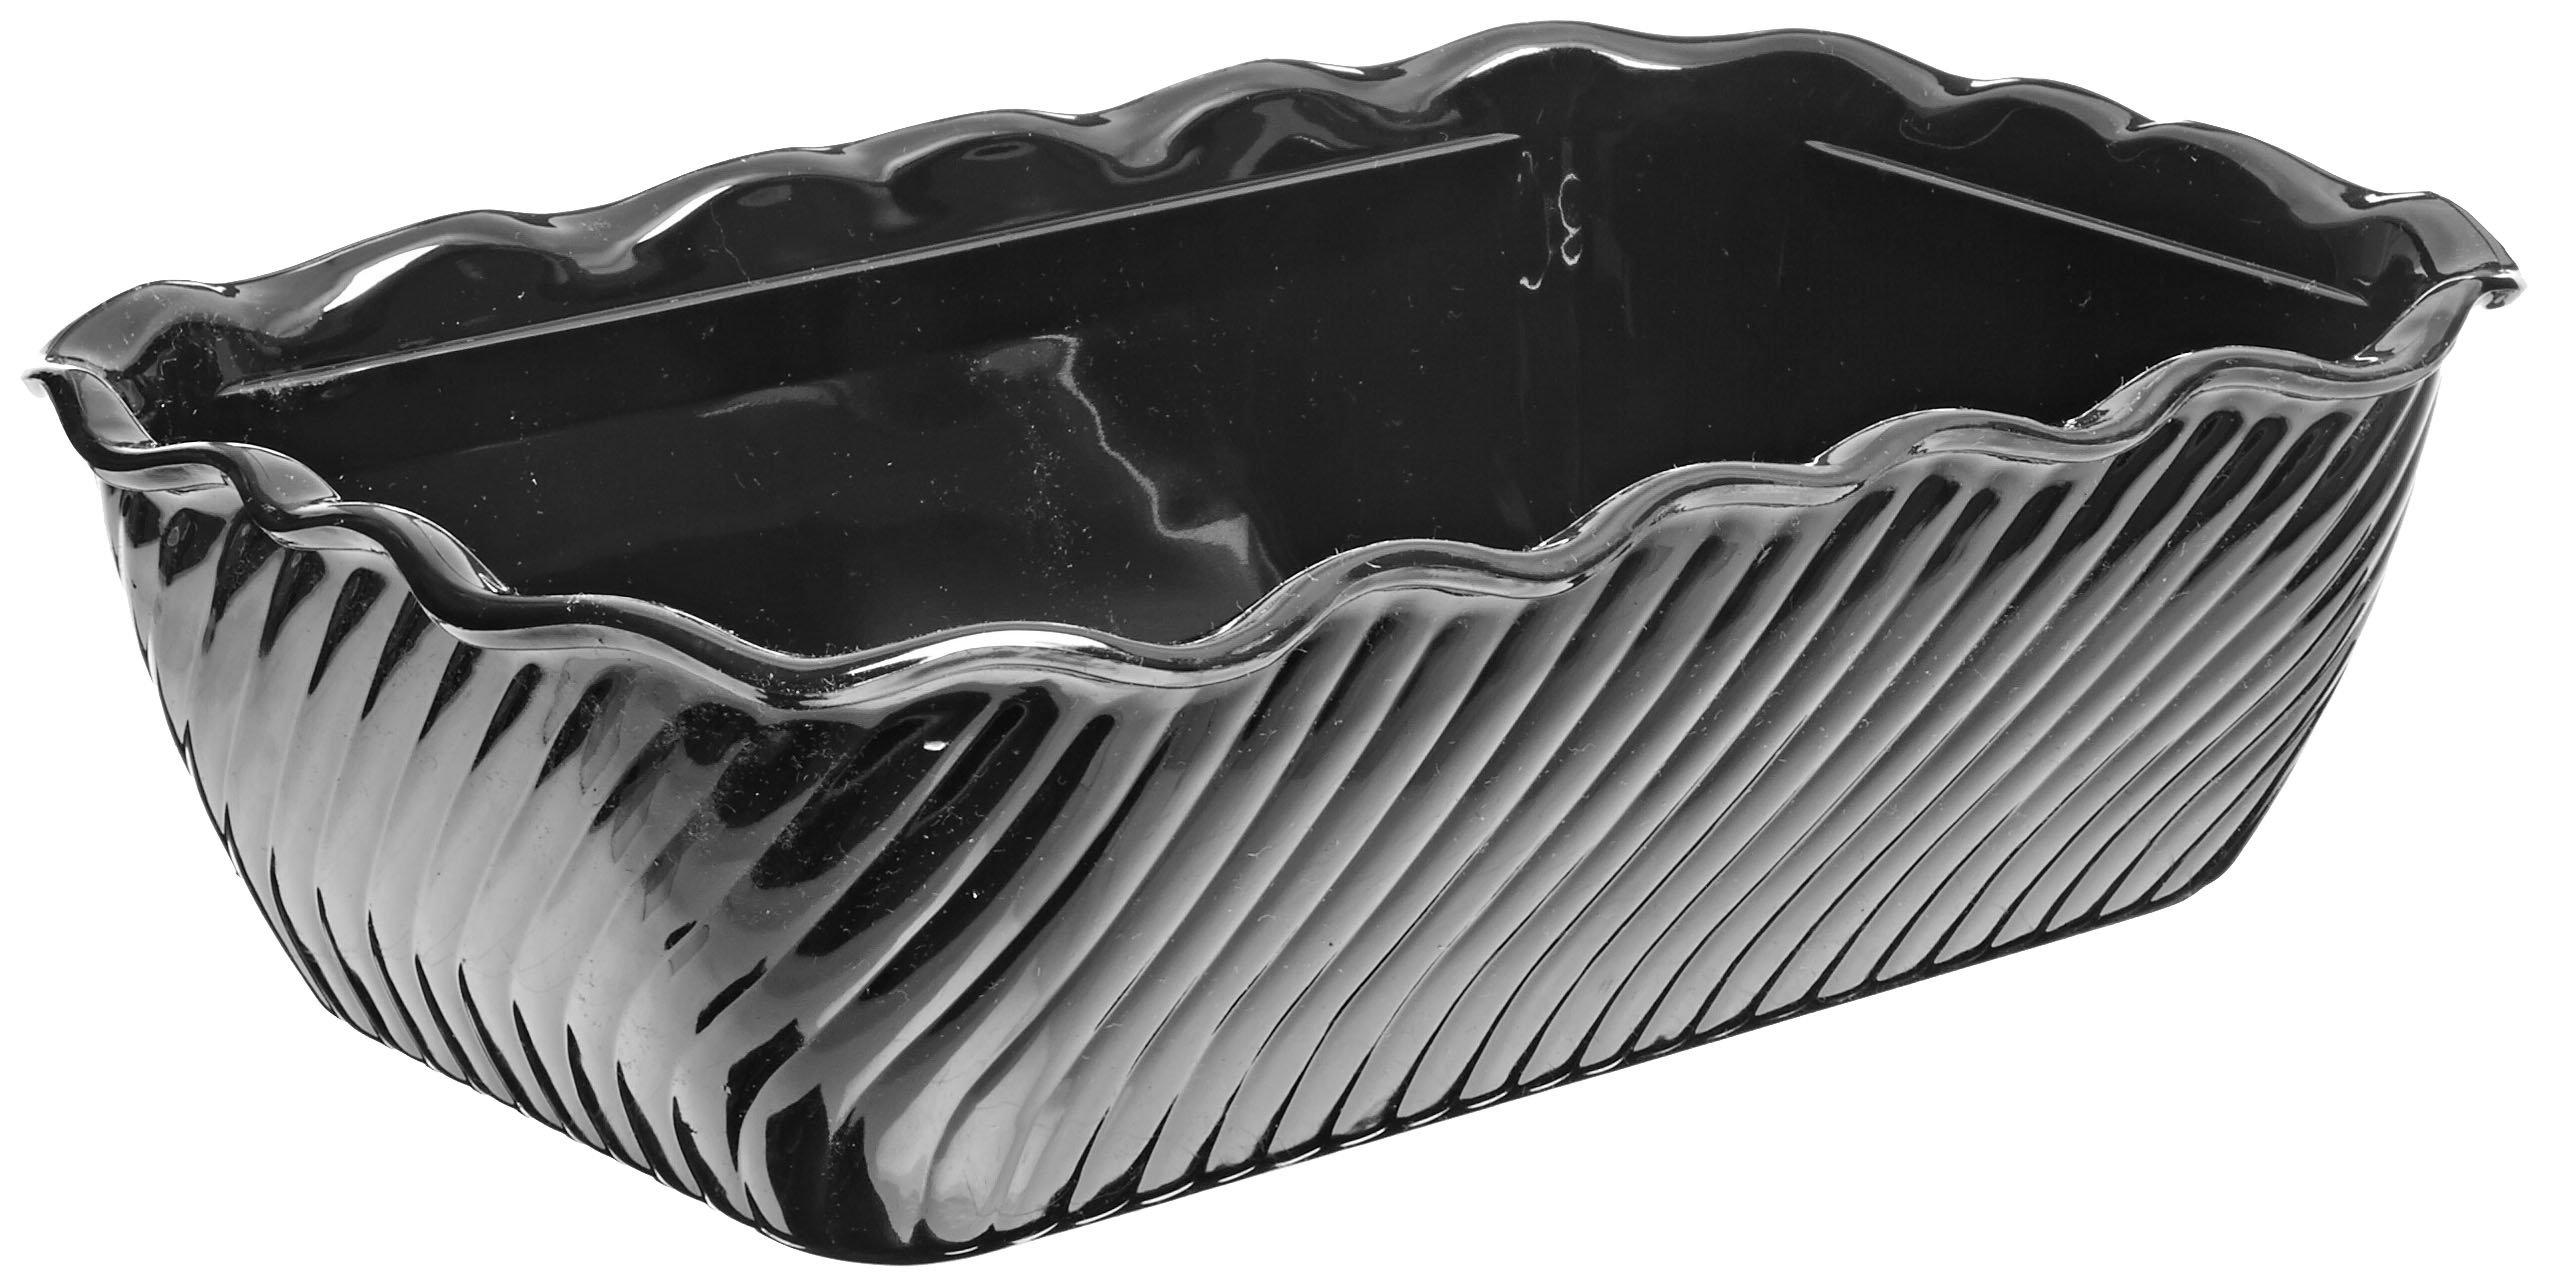 Carlisle 696303 Tulip Deli Food Display Crock, 5 Pound, Black (Pack of 6) by Carlisle (Image #2)